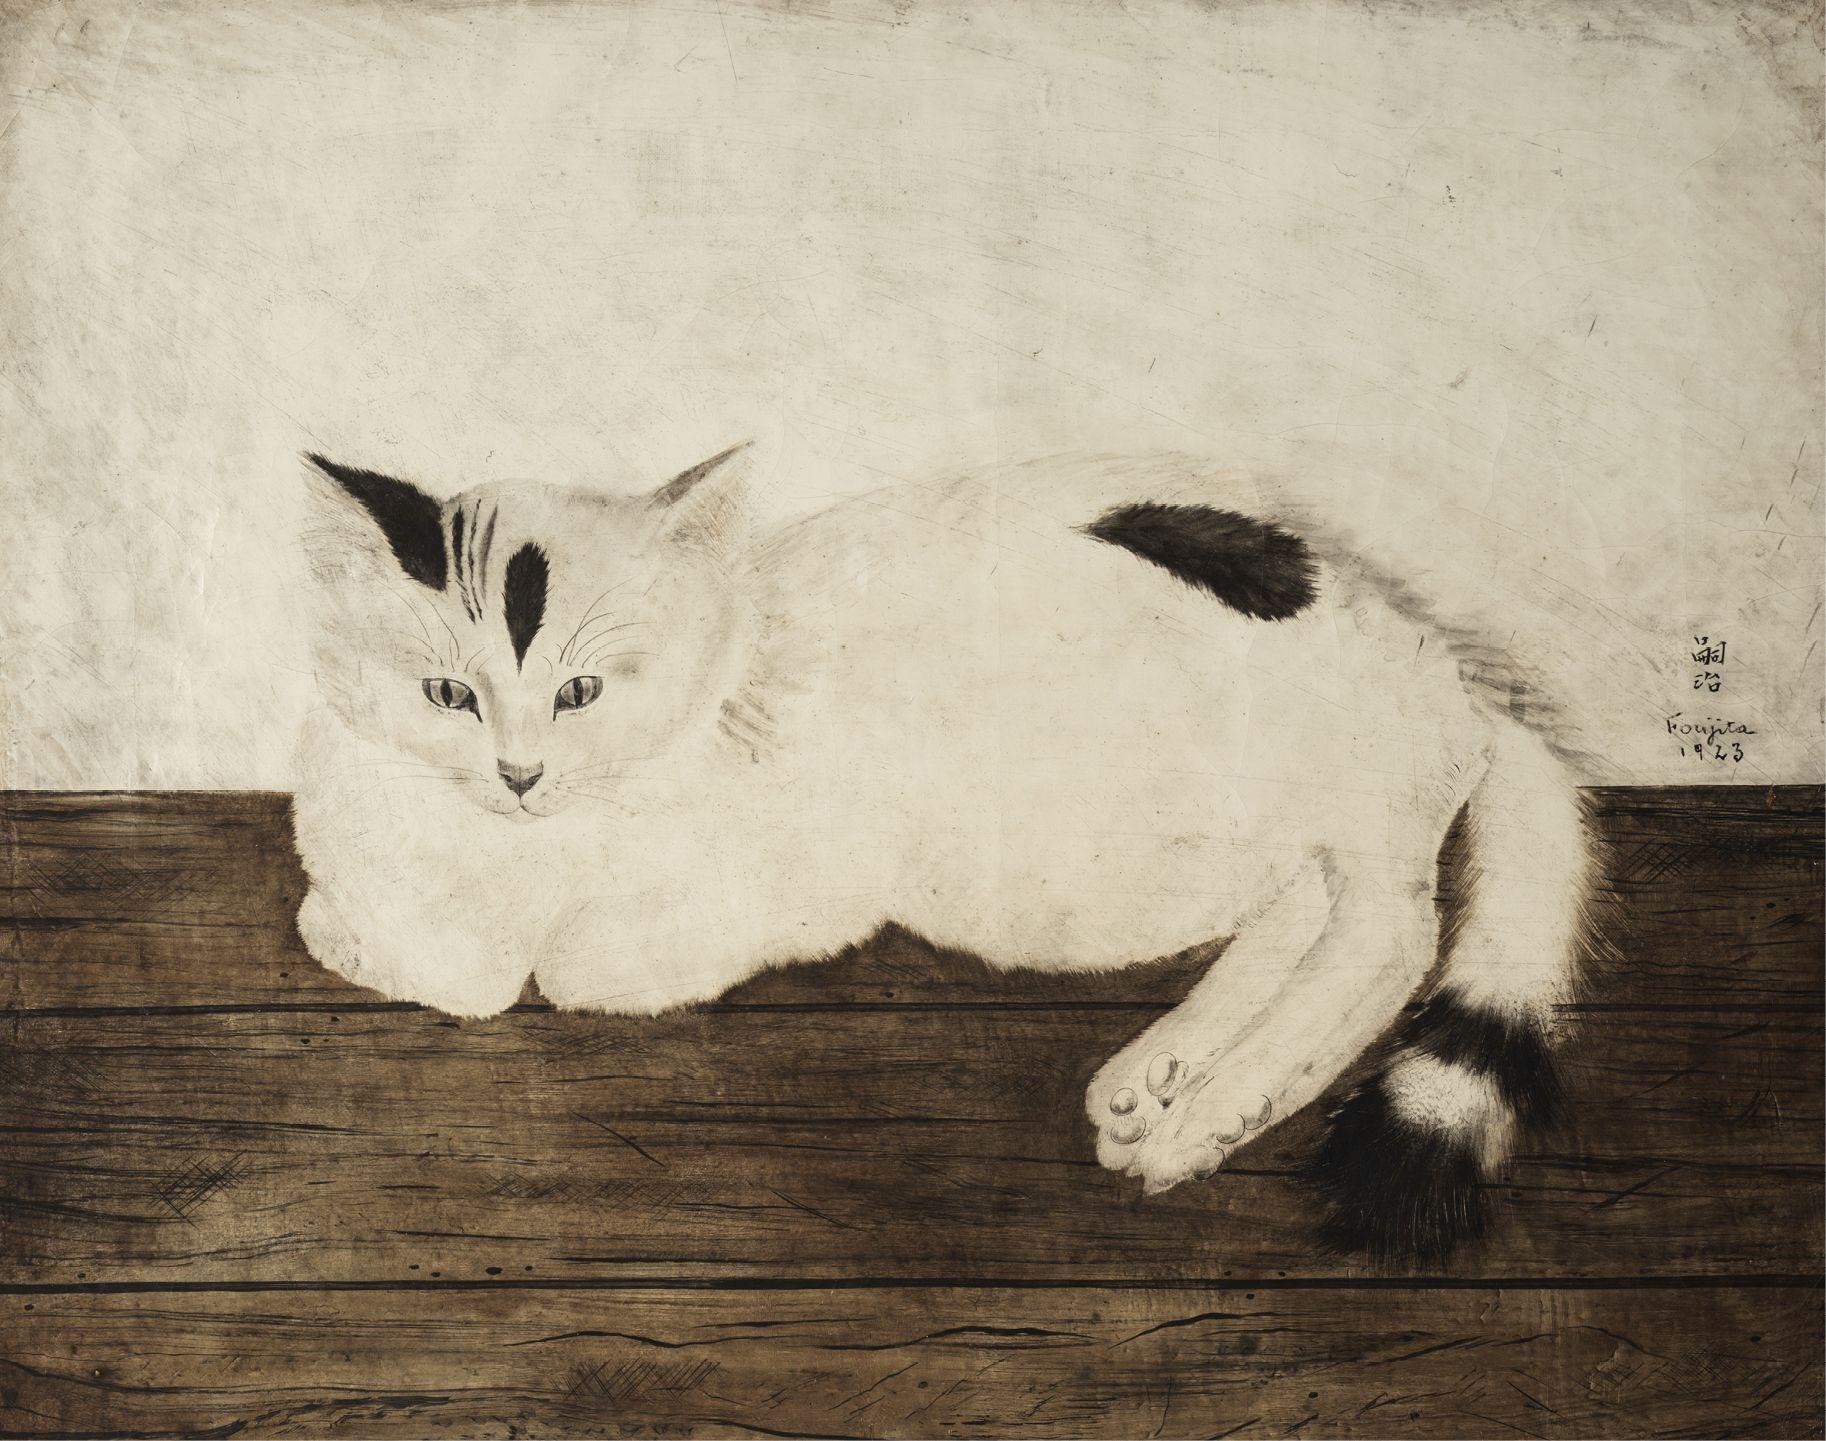 95 Leonard Tsuguharu Foujita 1886 1968 Chat Couche 1923 Huile Sur Toile Signee Art Impressionniste Et Modern En 2020 Art Impressionniste Art Huile Sur Toile